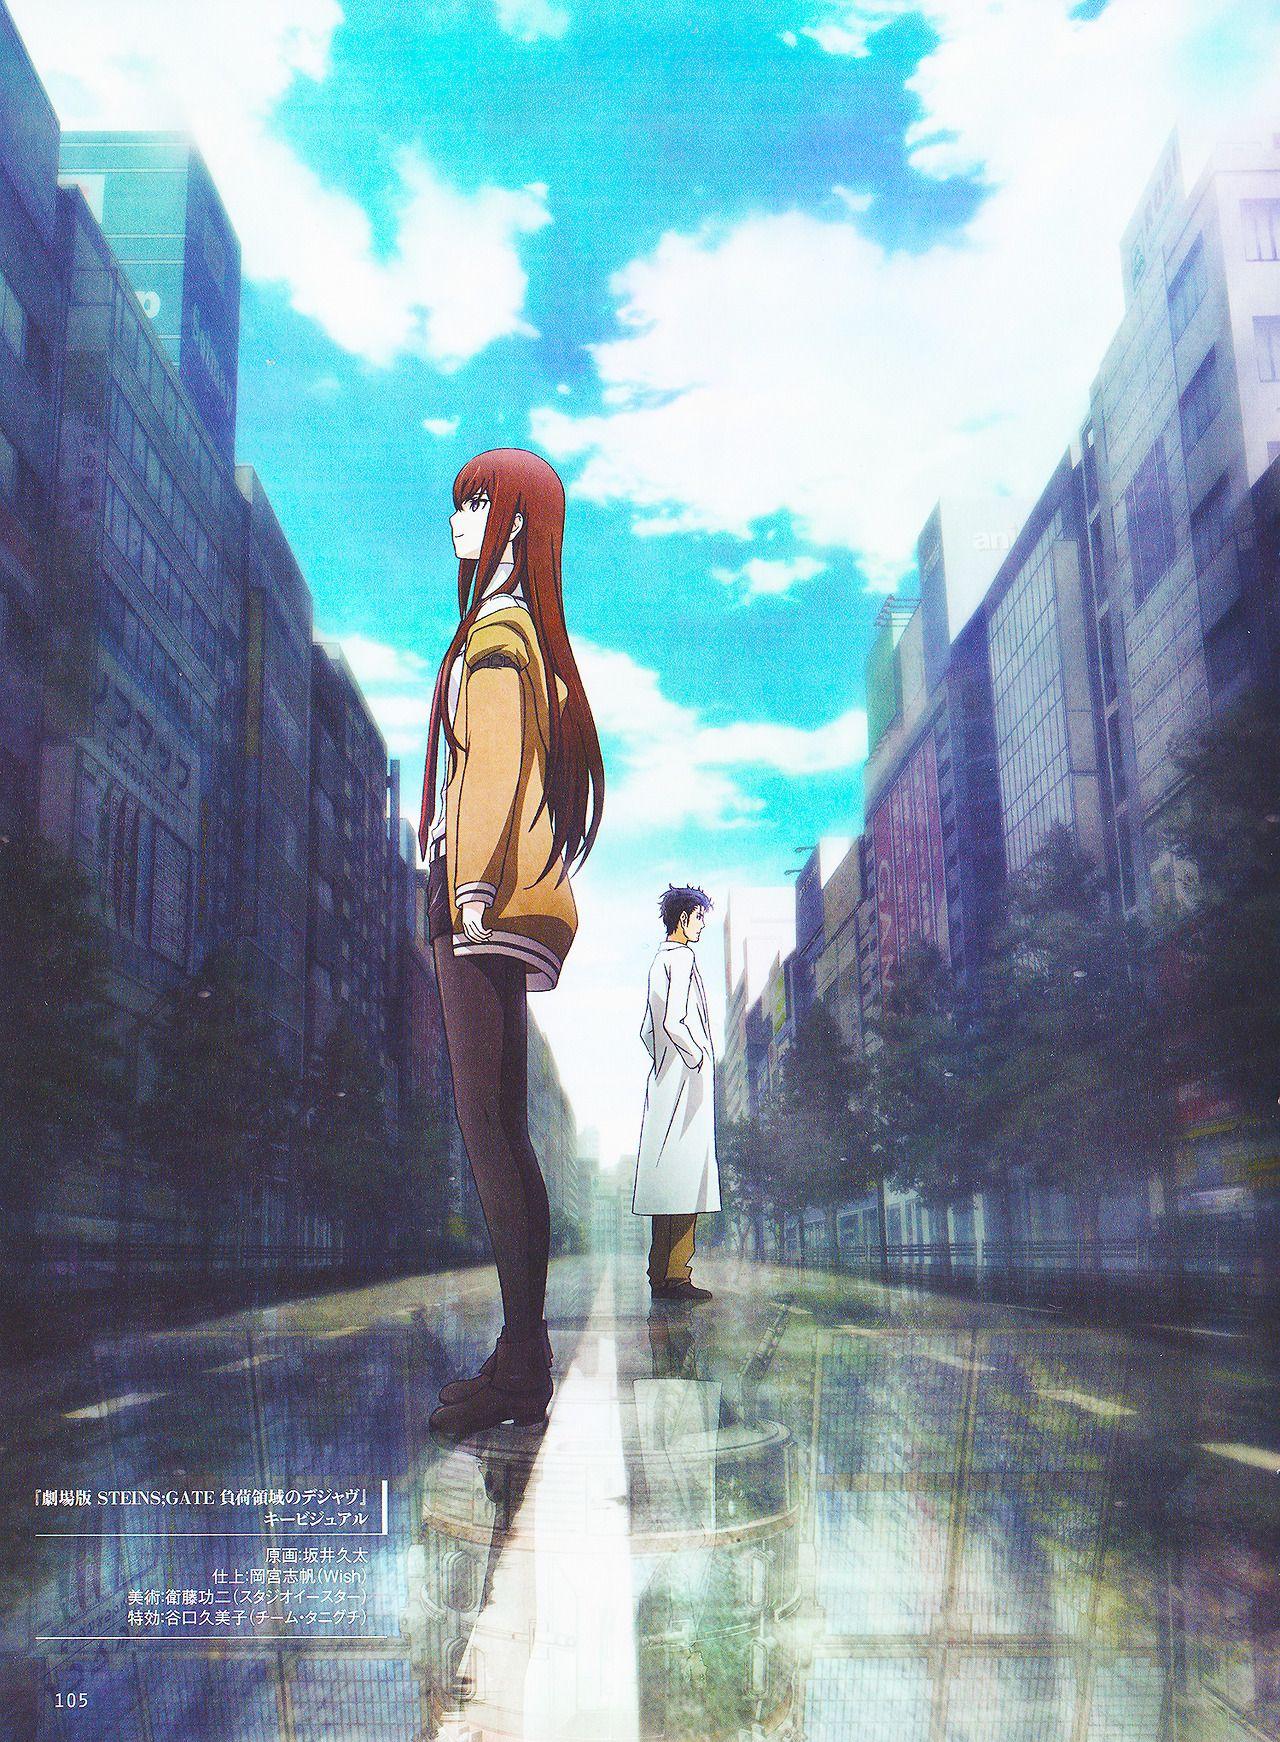 Skyclad Observer Steins gate 0, Steins, Anime